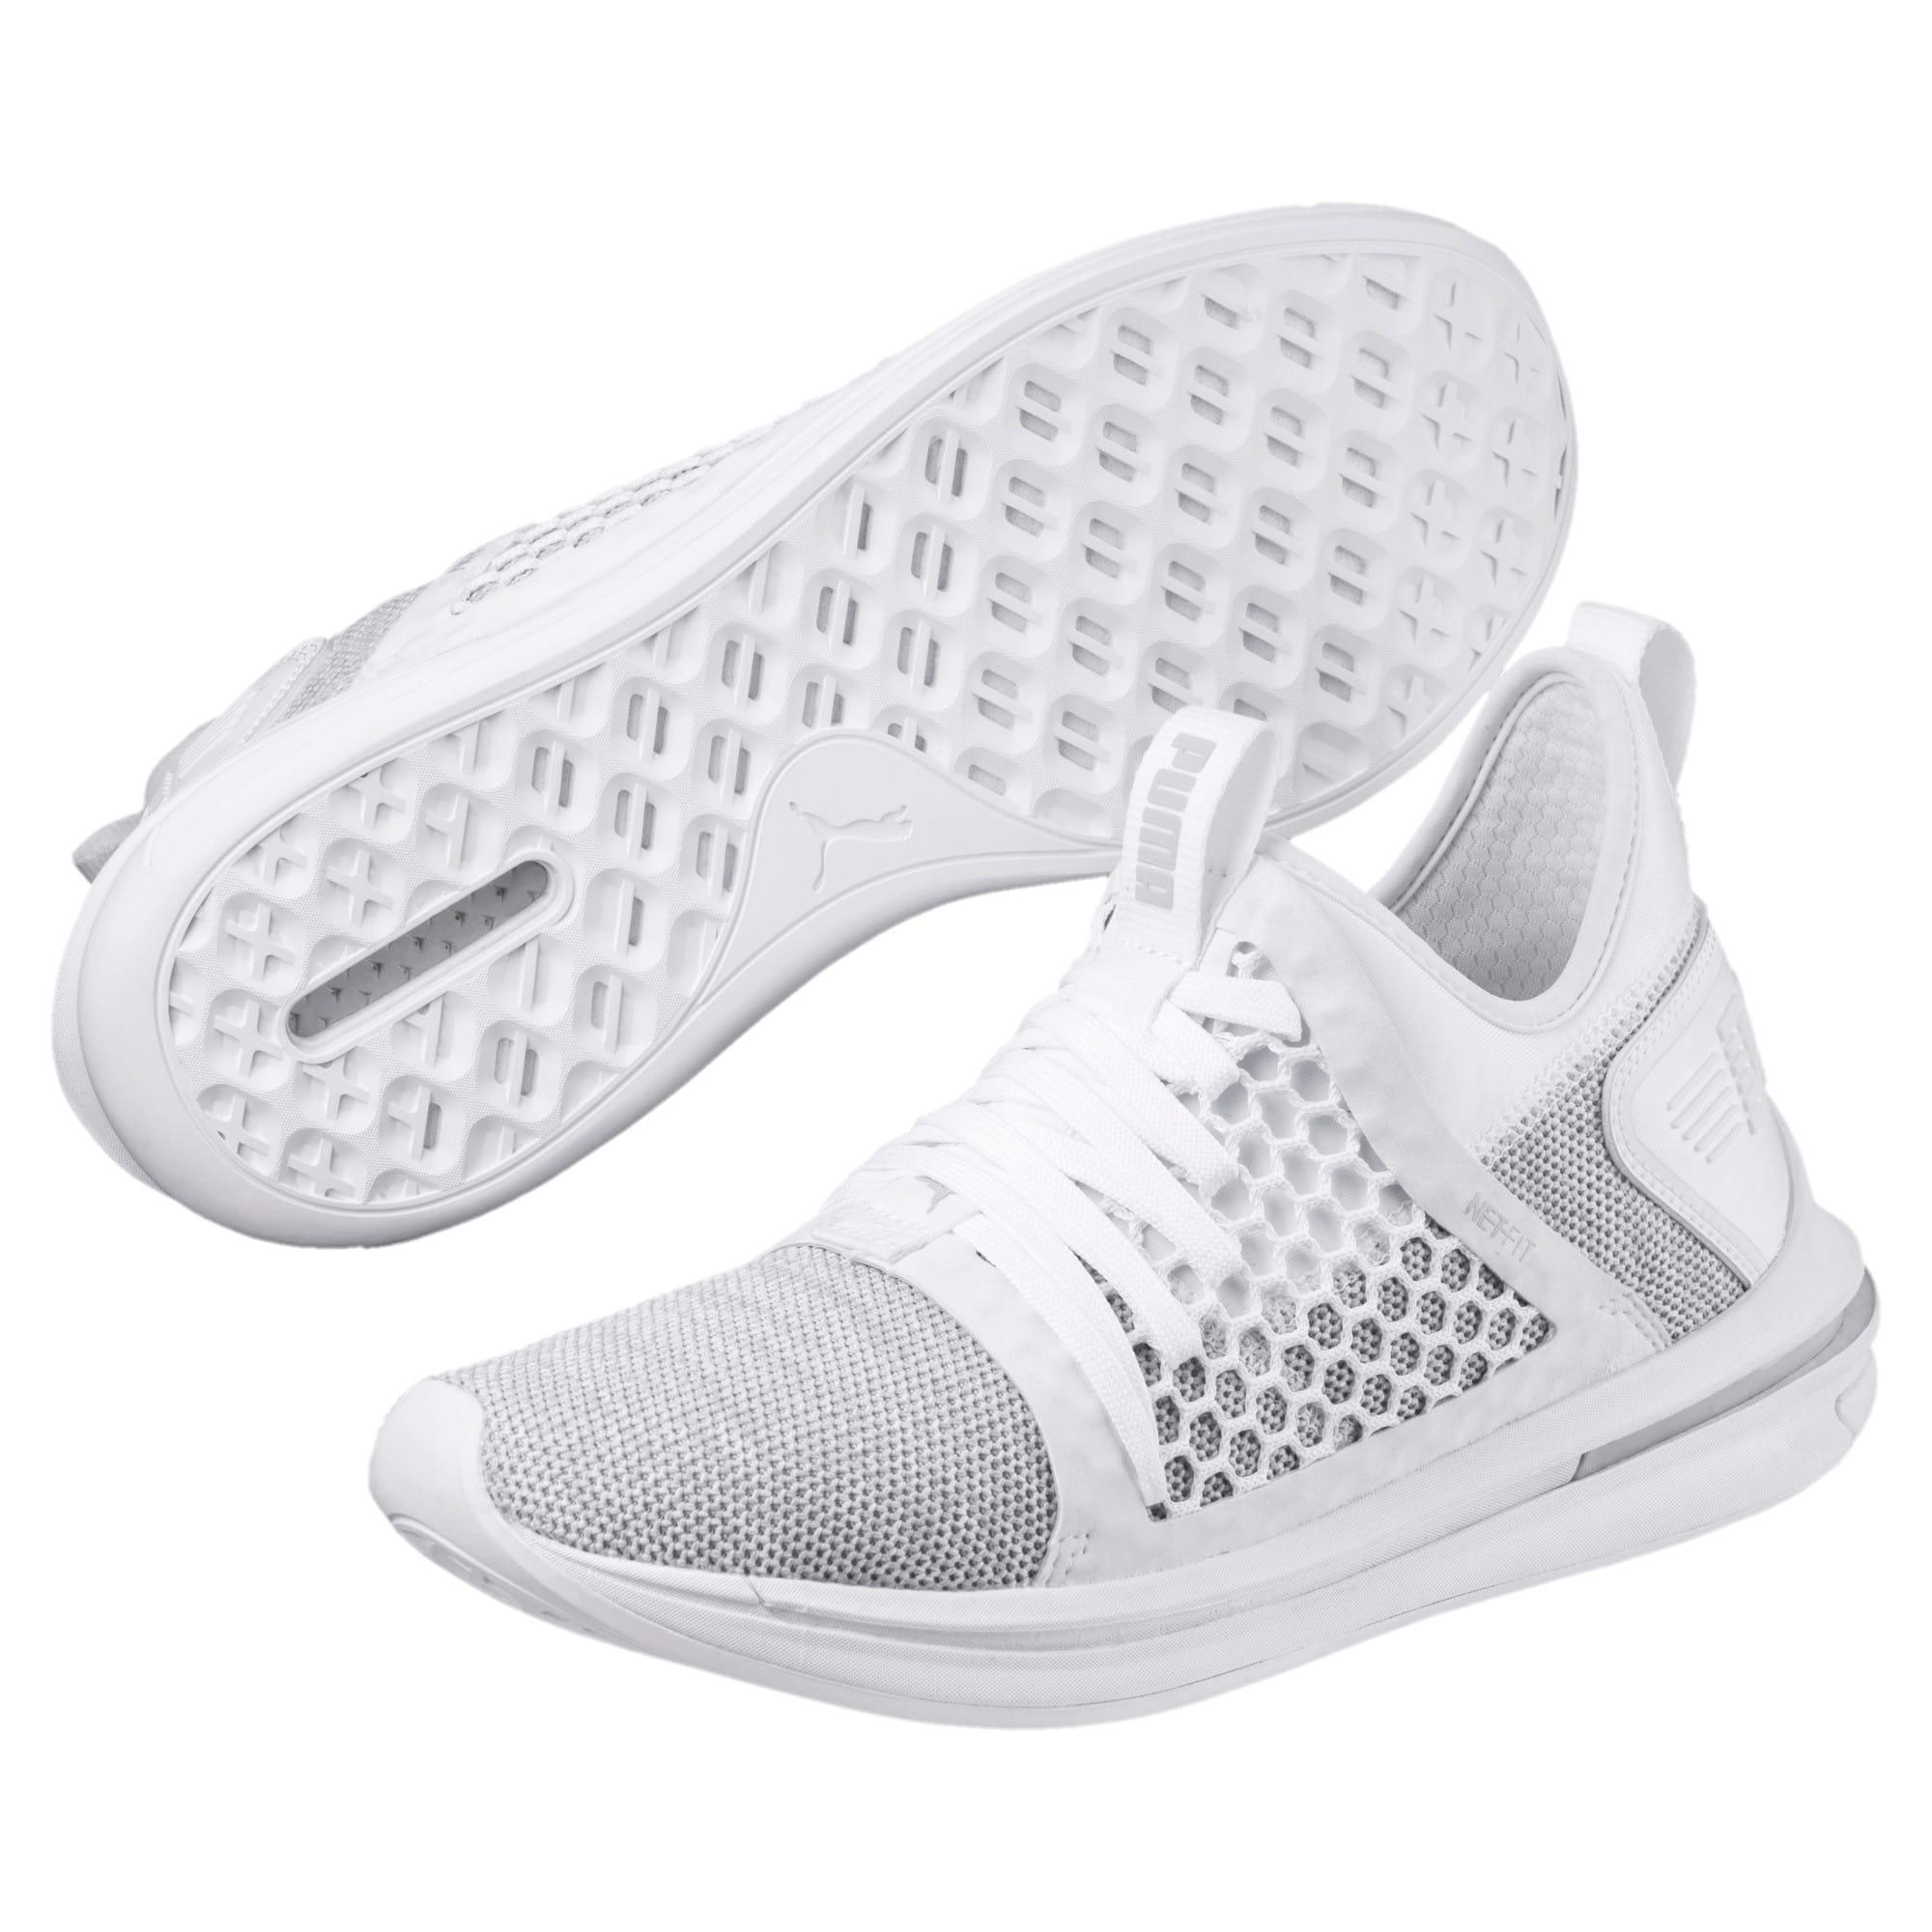 Thumbnail 2 of IGNITE Limitless SR NETFIT Men's Trainer Shoes, Puma White-Puma White, medium-IND